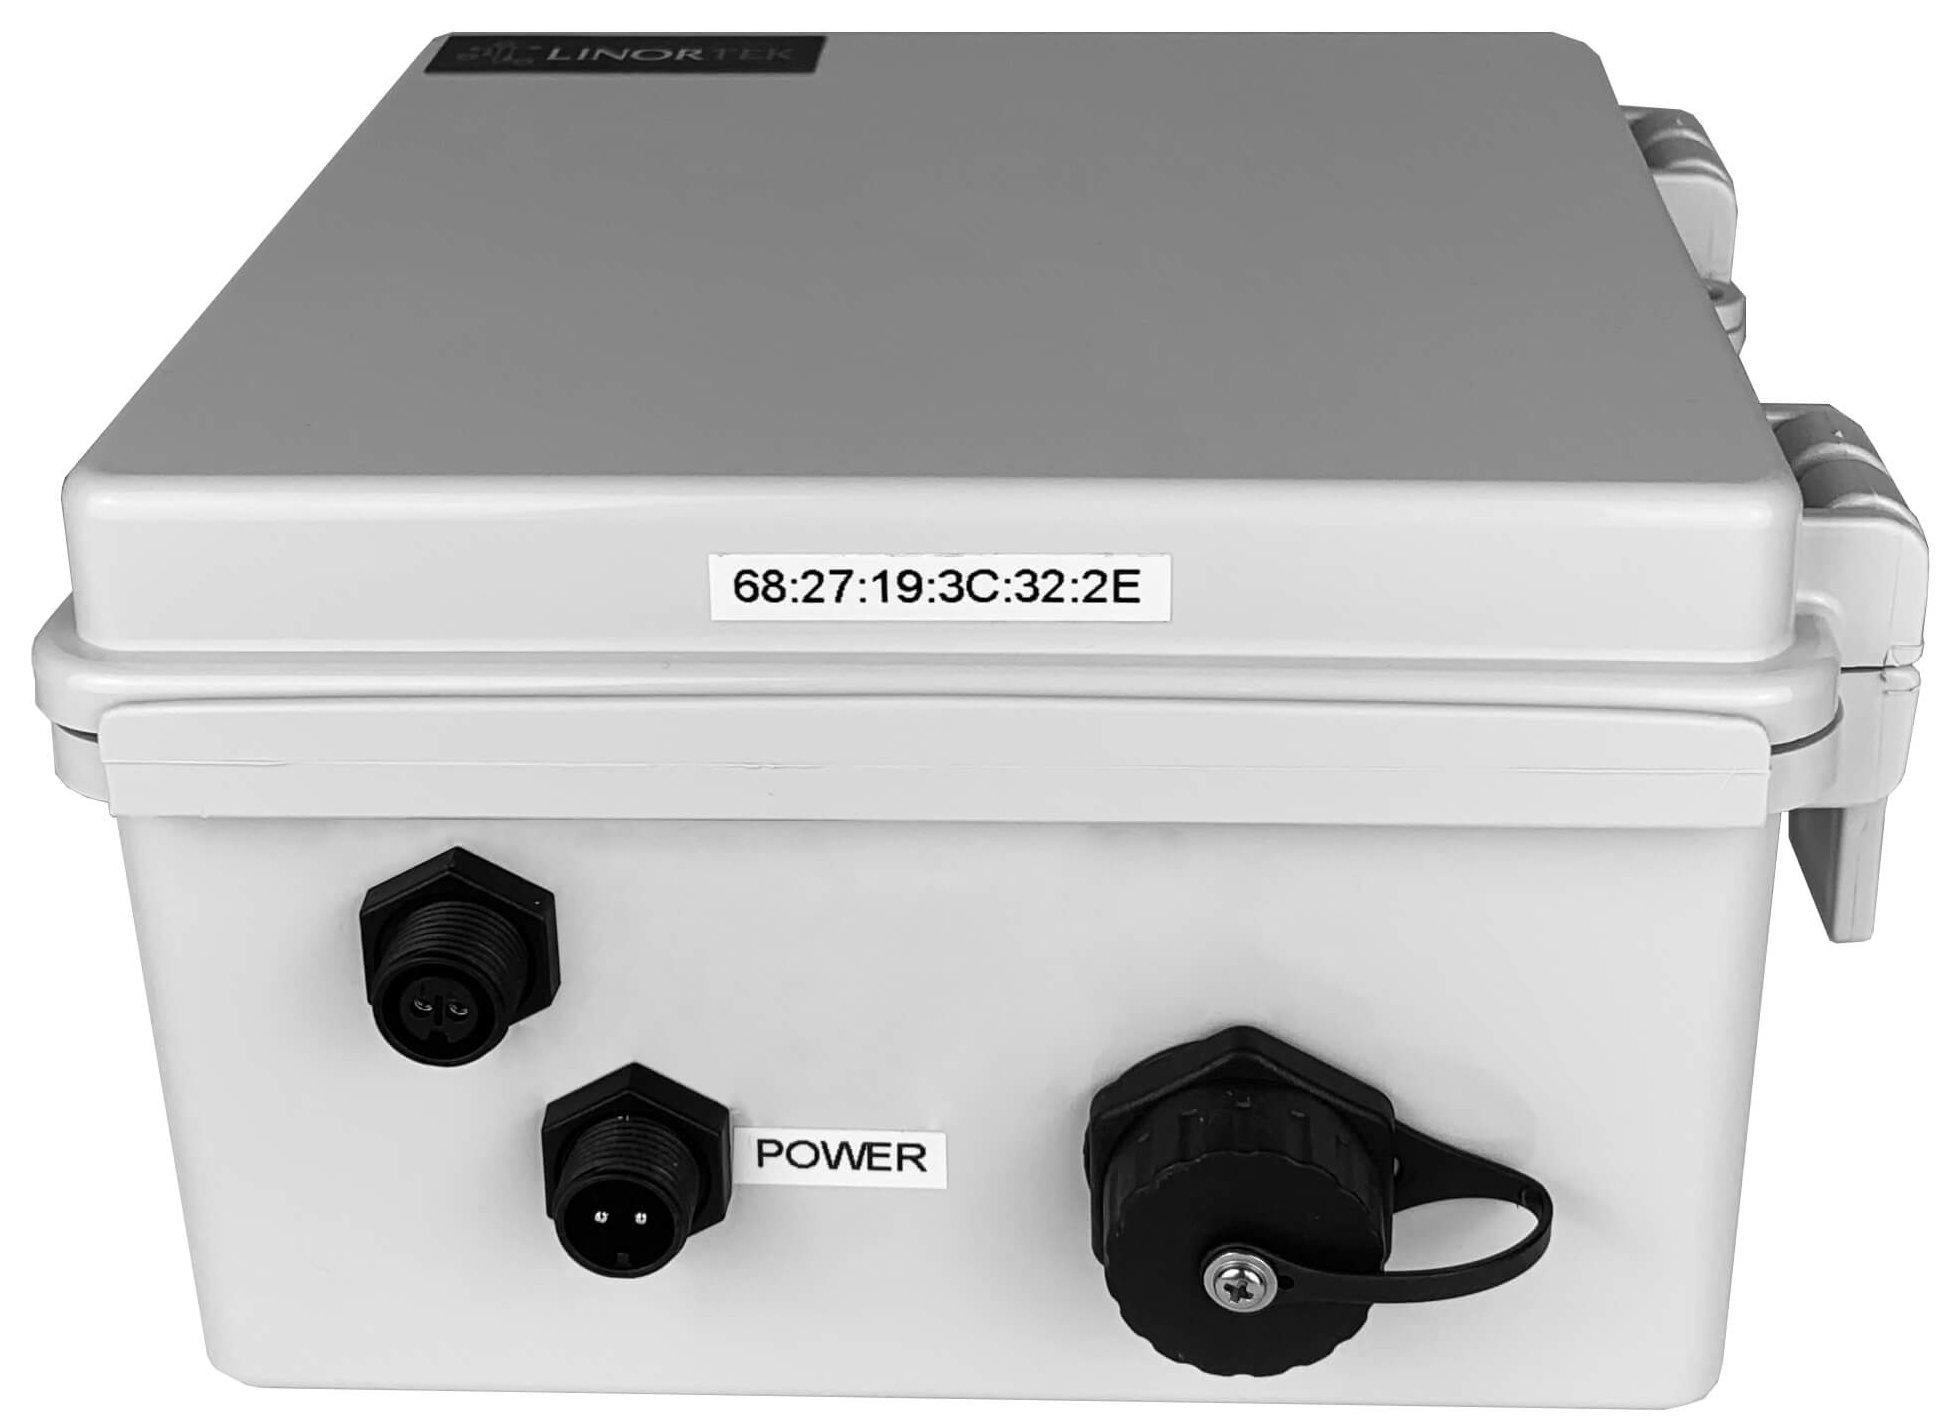 Netbell-K24 Network Bell Timer Controller 24VAC AND 12VDC